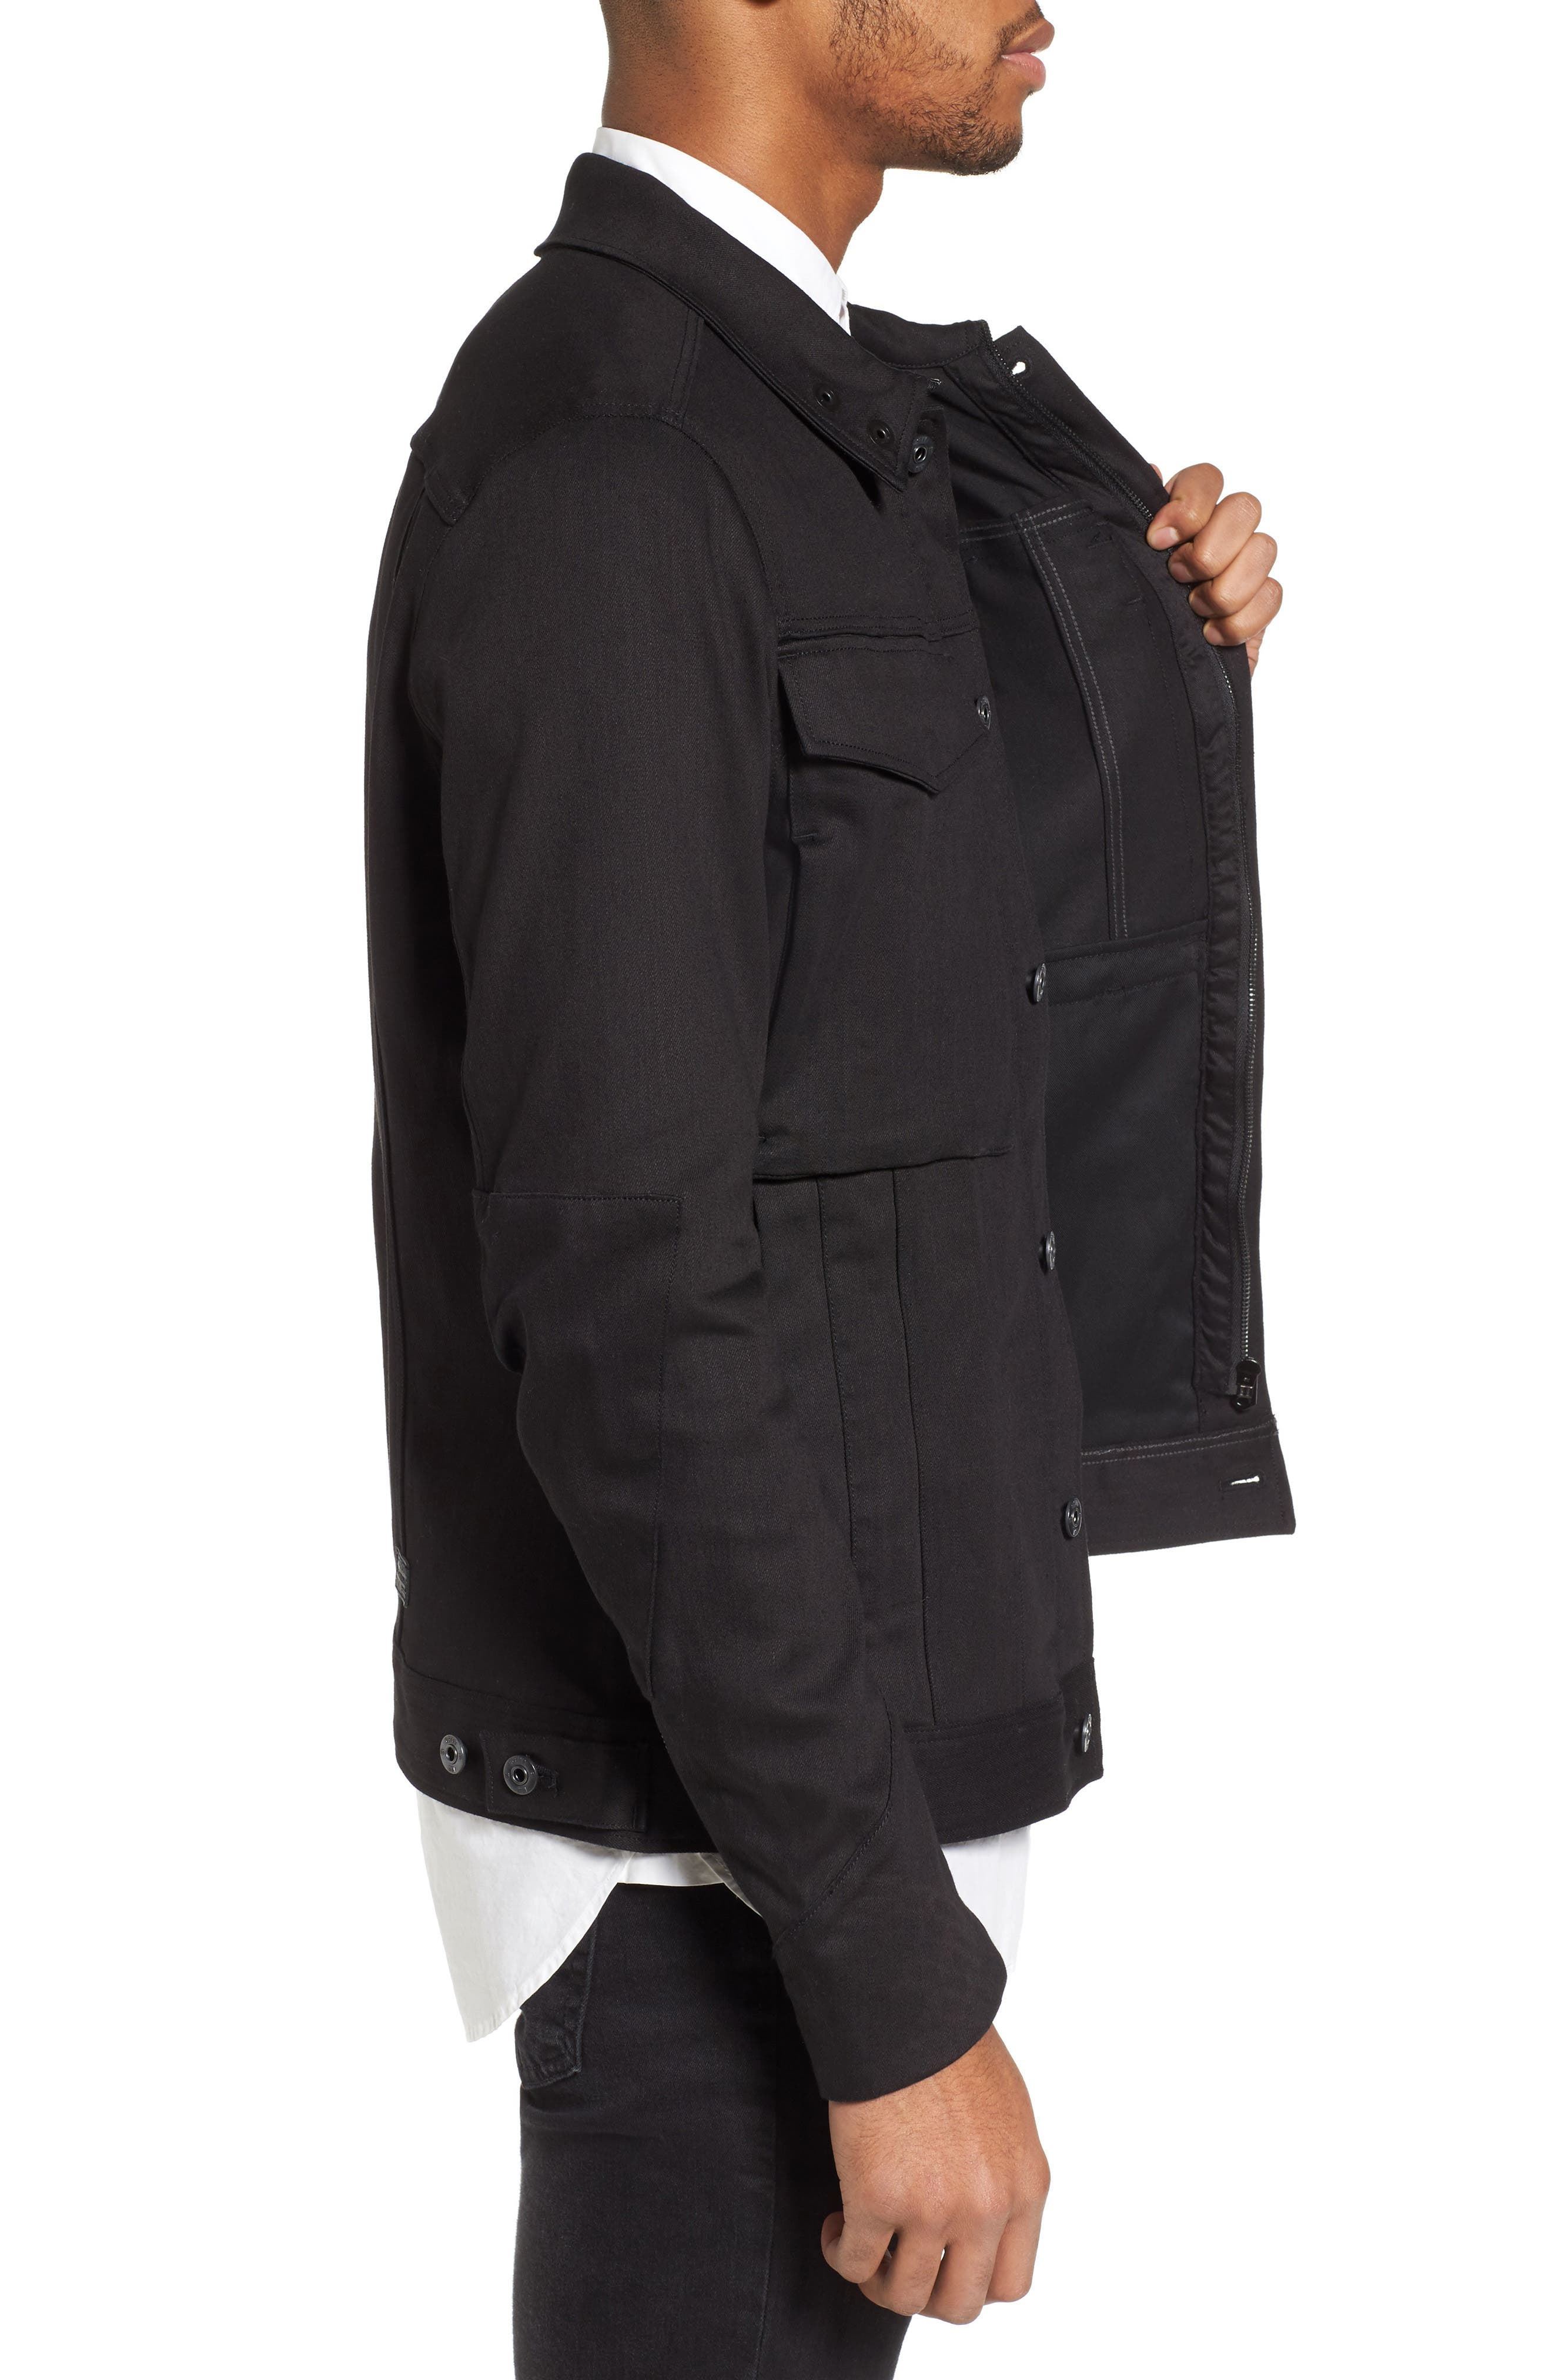 Vodan 3D Slim Jacket,                             Alternate thumbnail 3, color,                             401